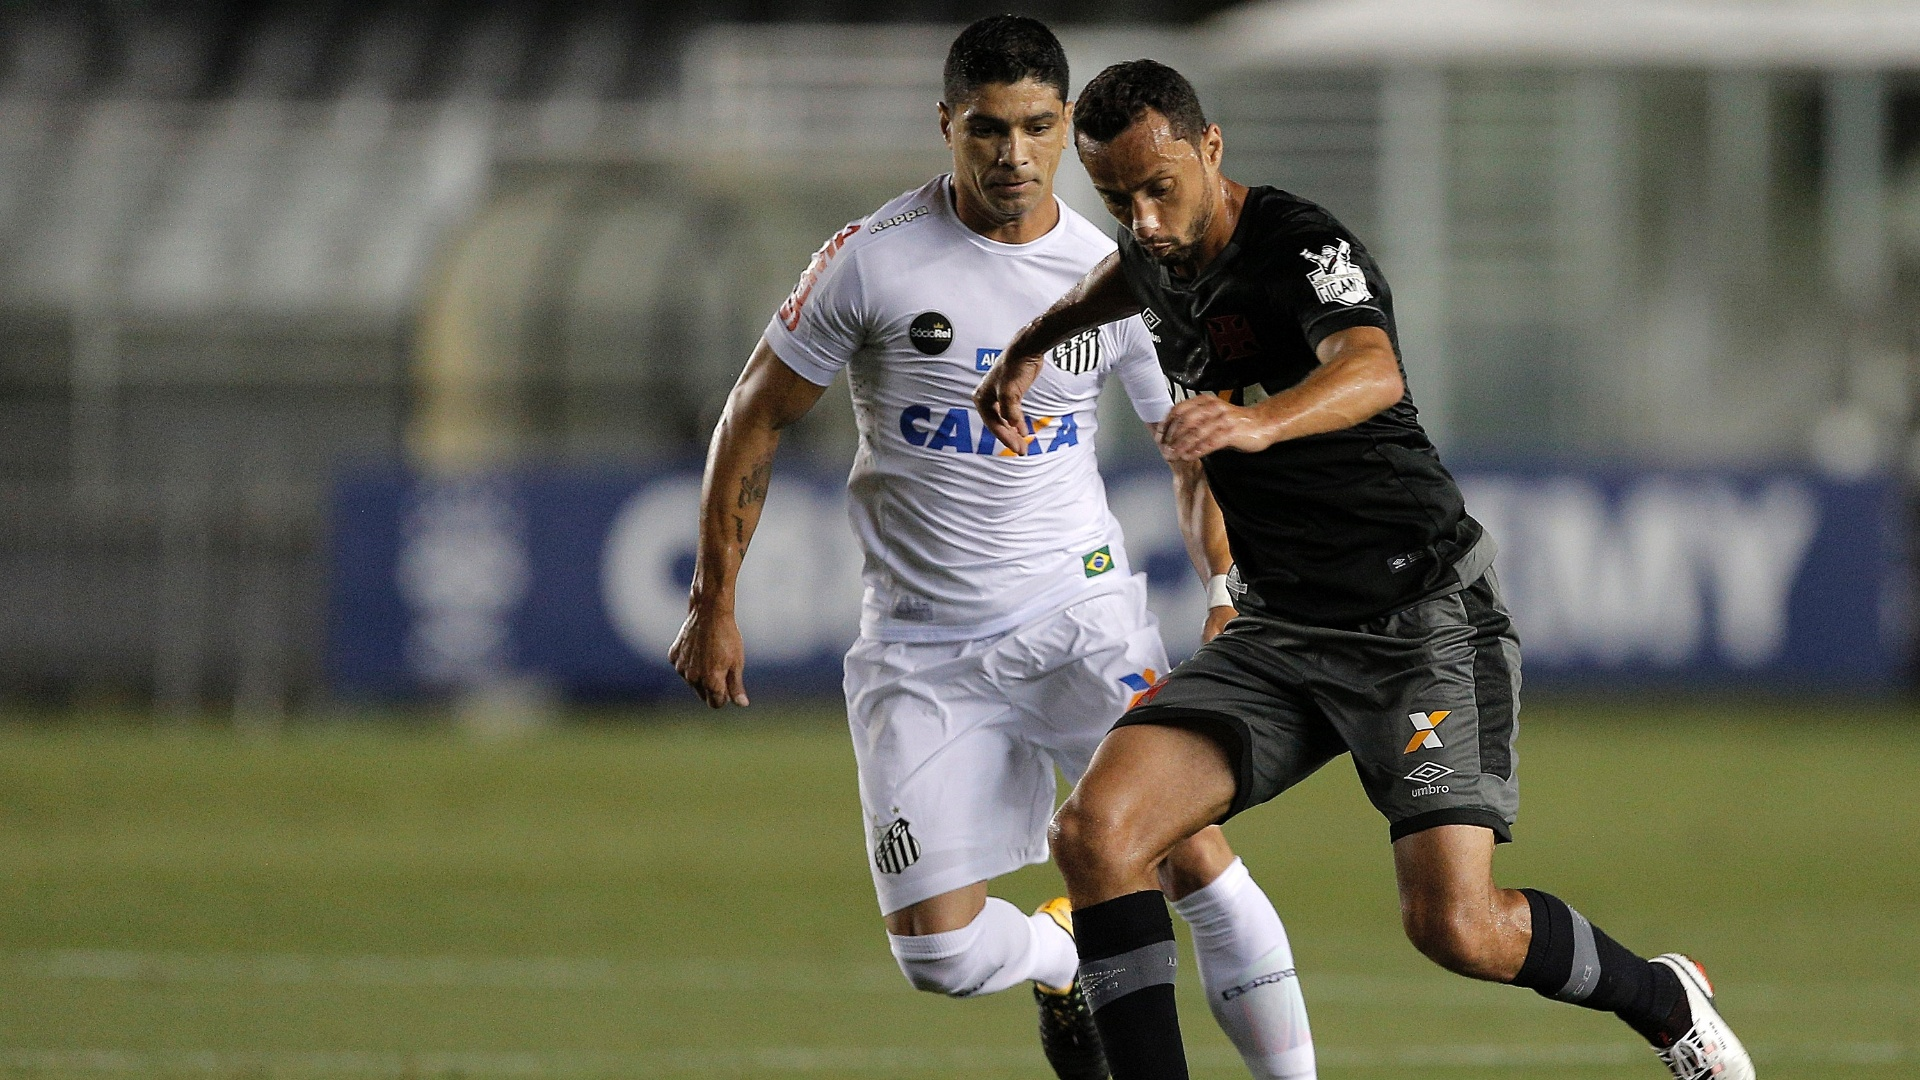 Renato e Nenê disputam lance em Santos x Vasco